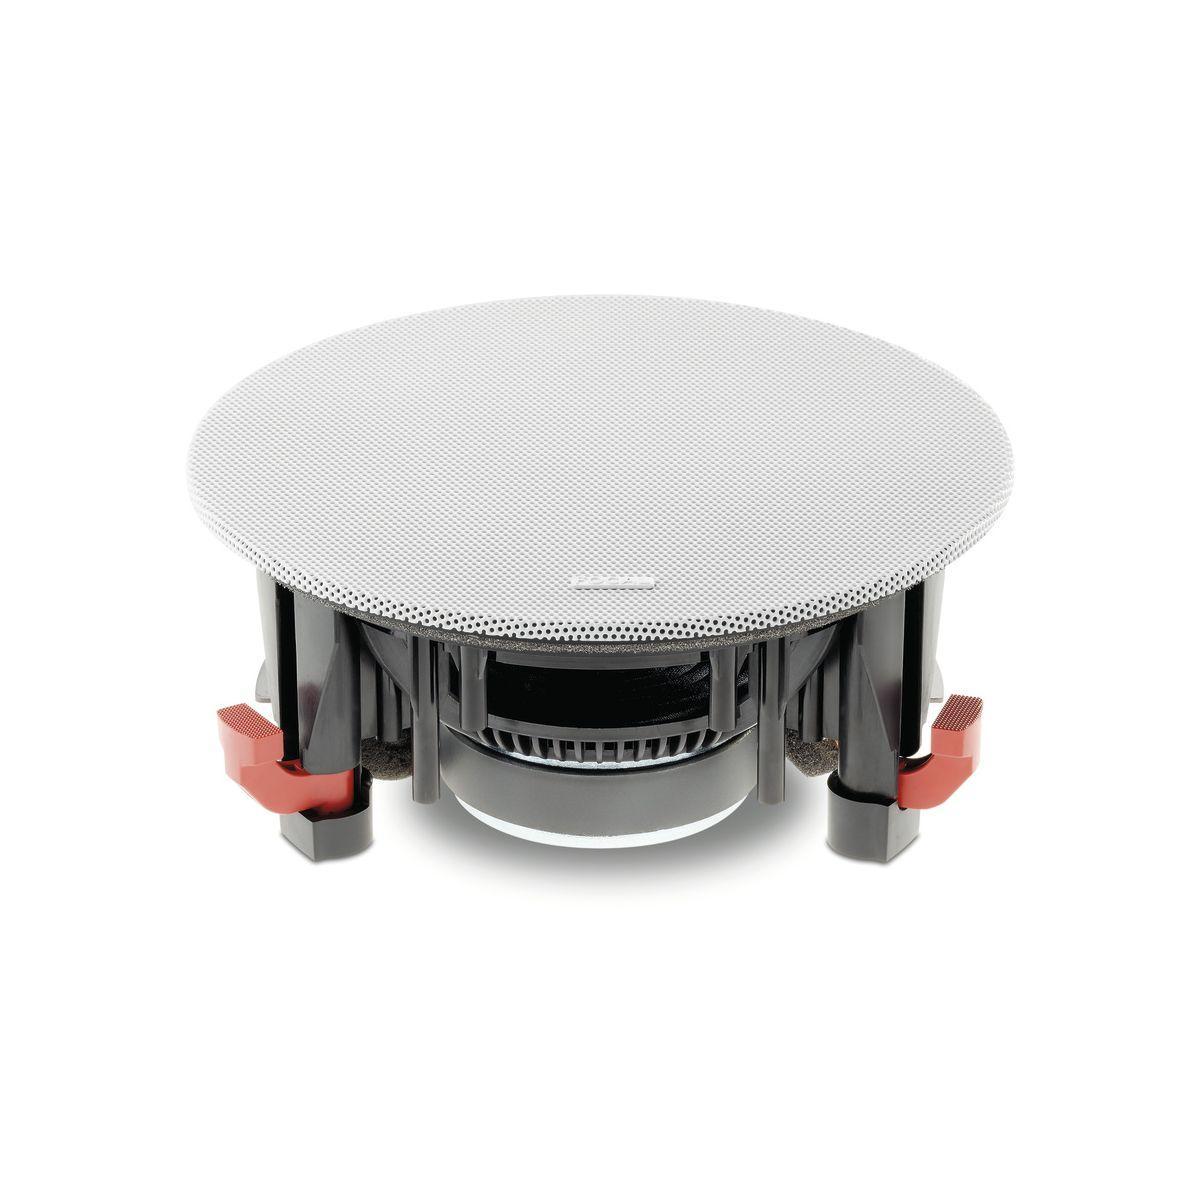 Enceinte encastrable focal 100 icw6 - livraison offerte : code livprem